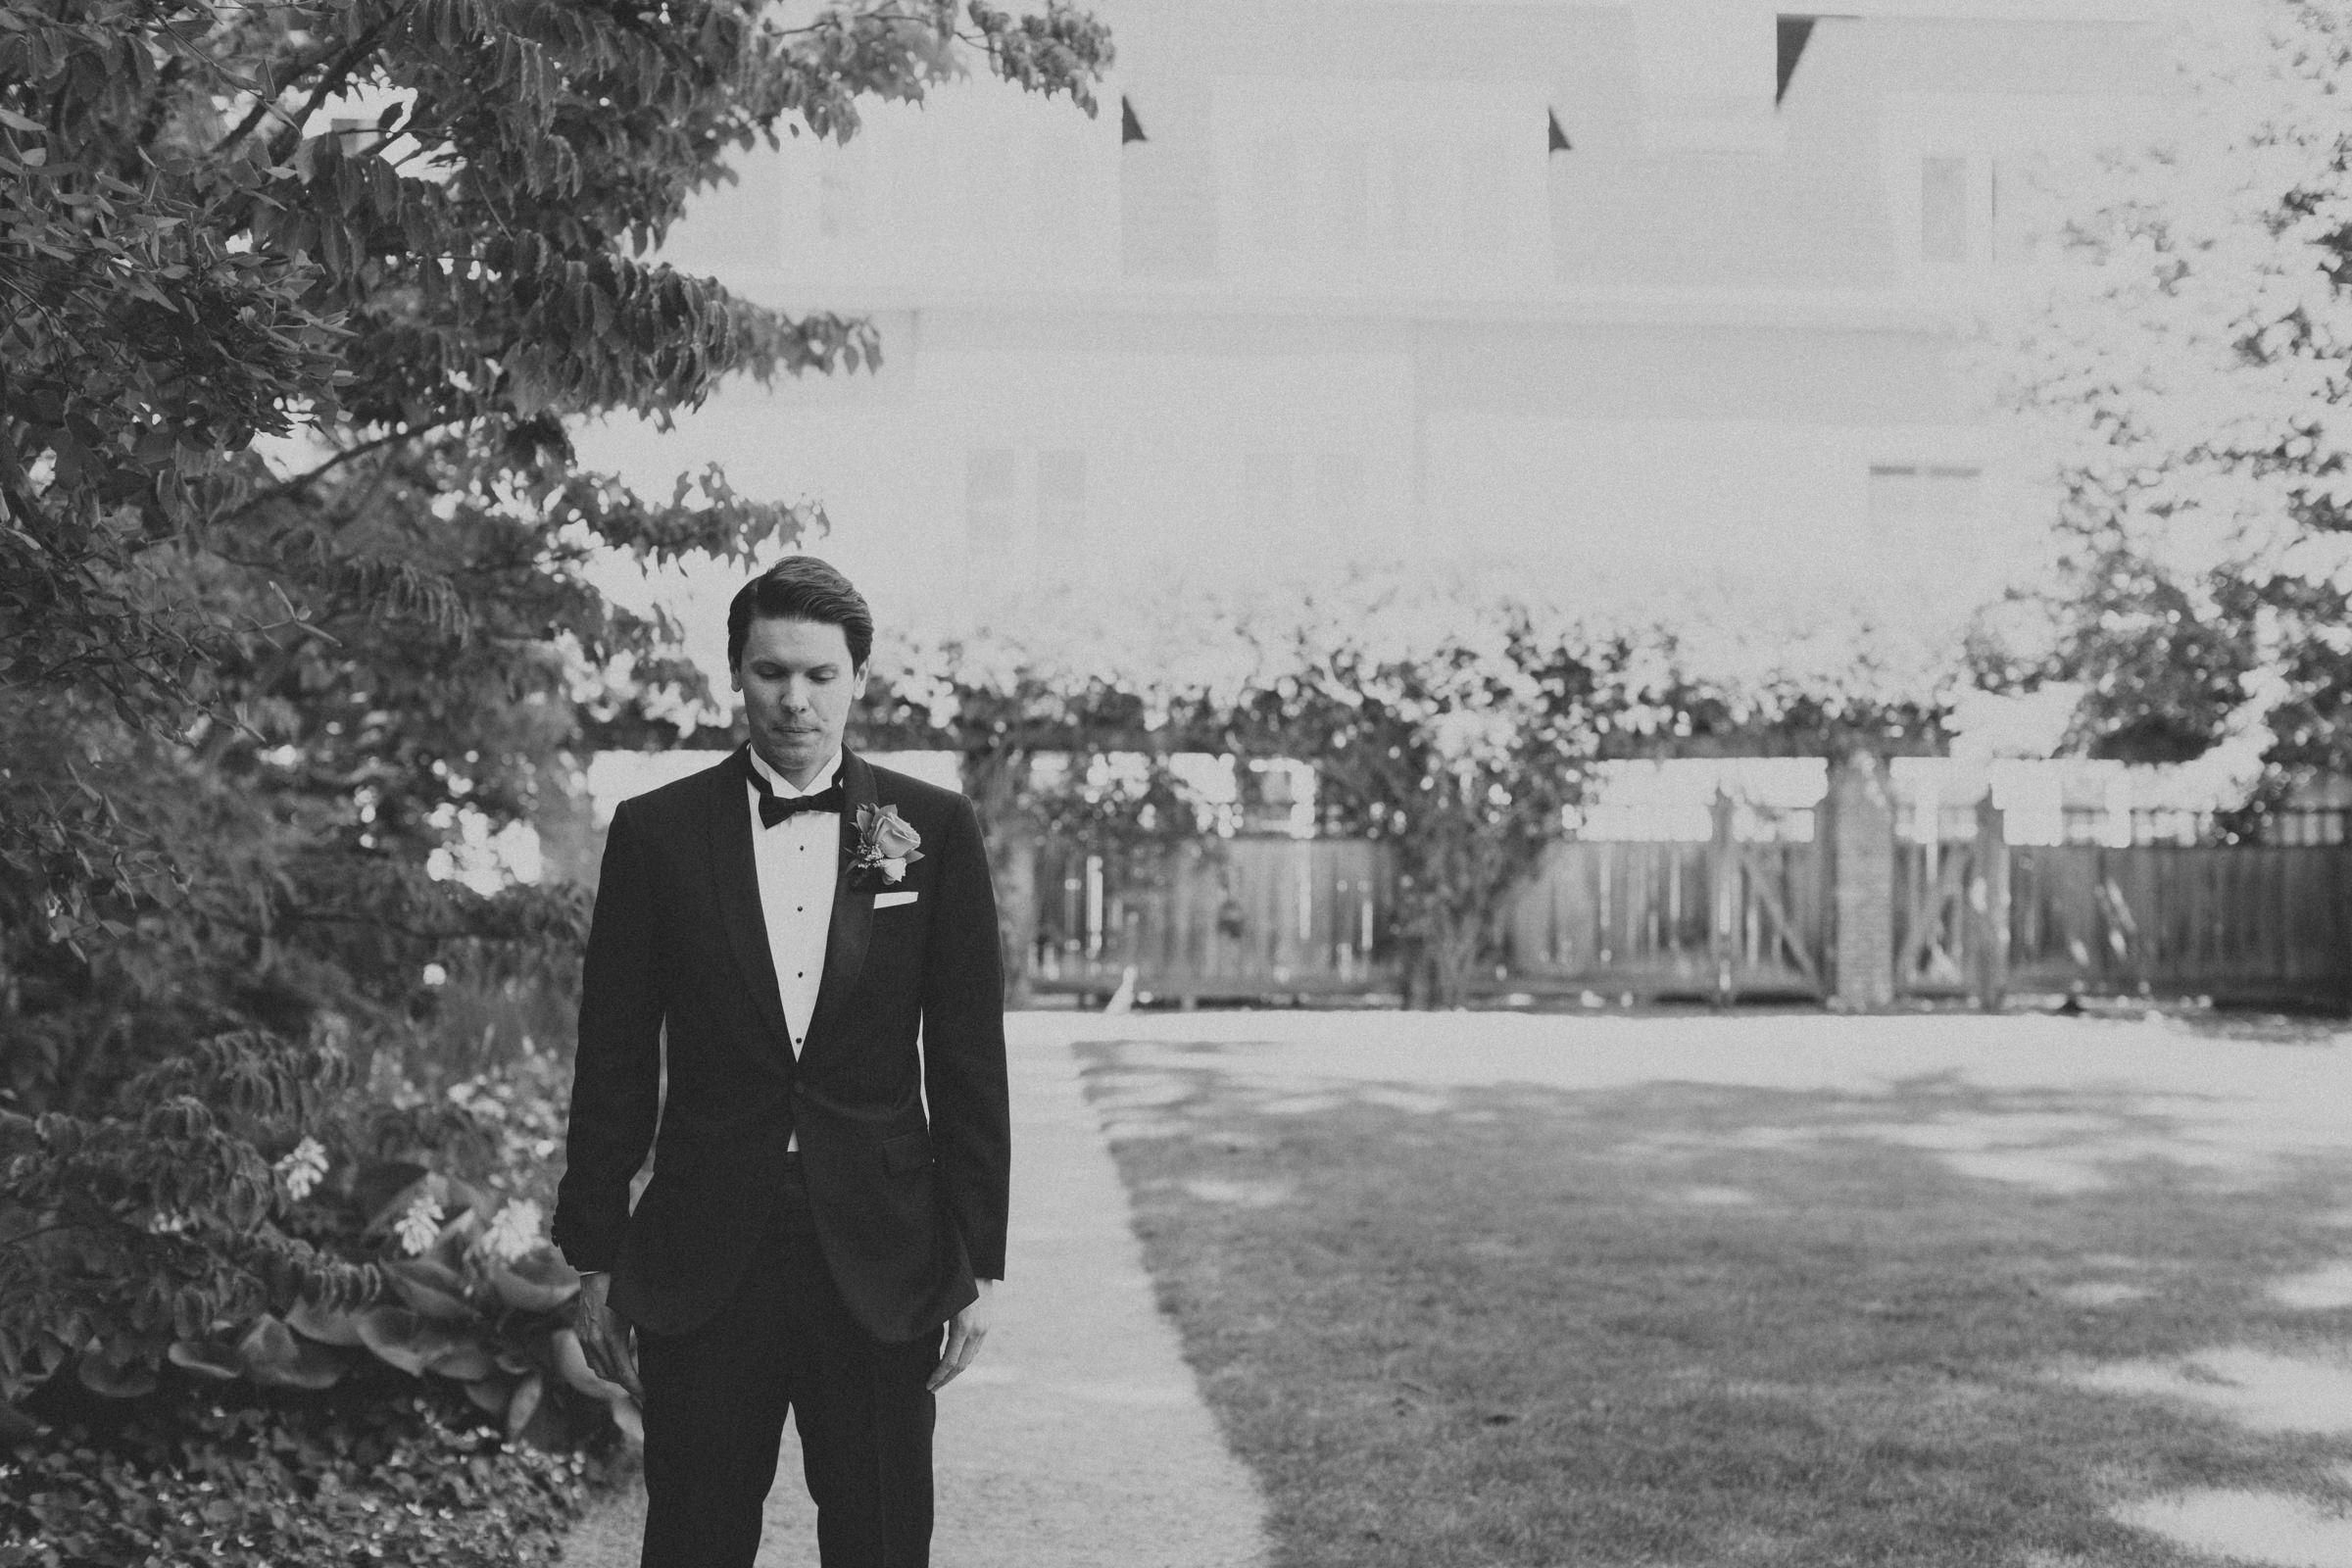 Langdon-Hall-wedding-photography-Cambridge-by-Sam-Wong-of-Visual-Cravings_Sarah-Ryan_15.jpg